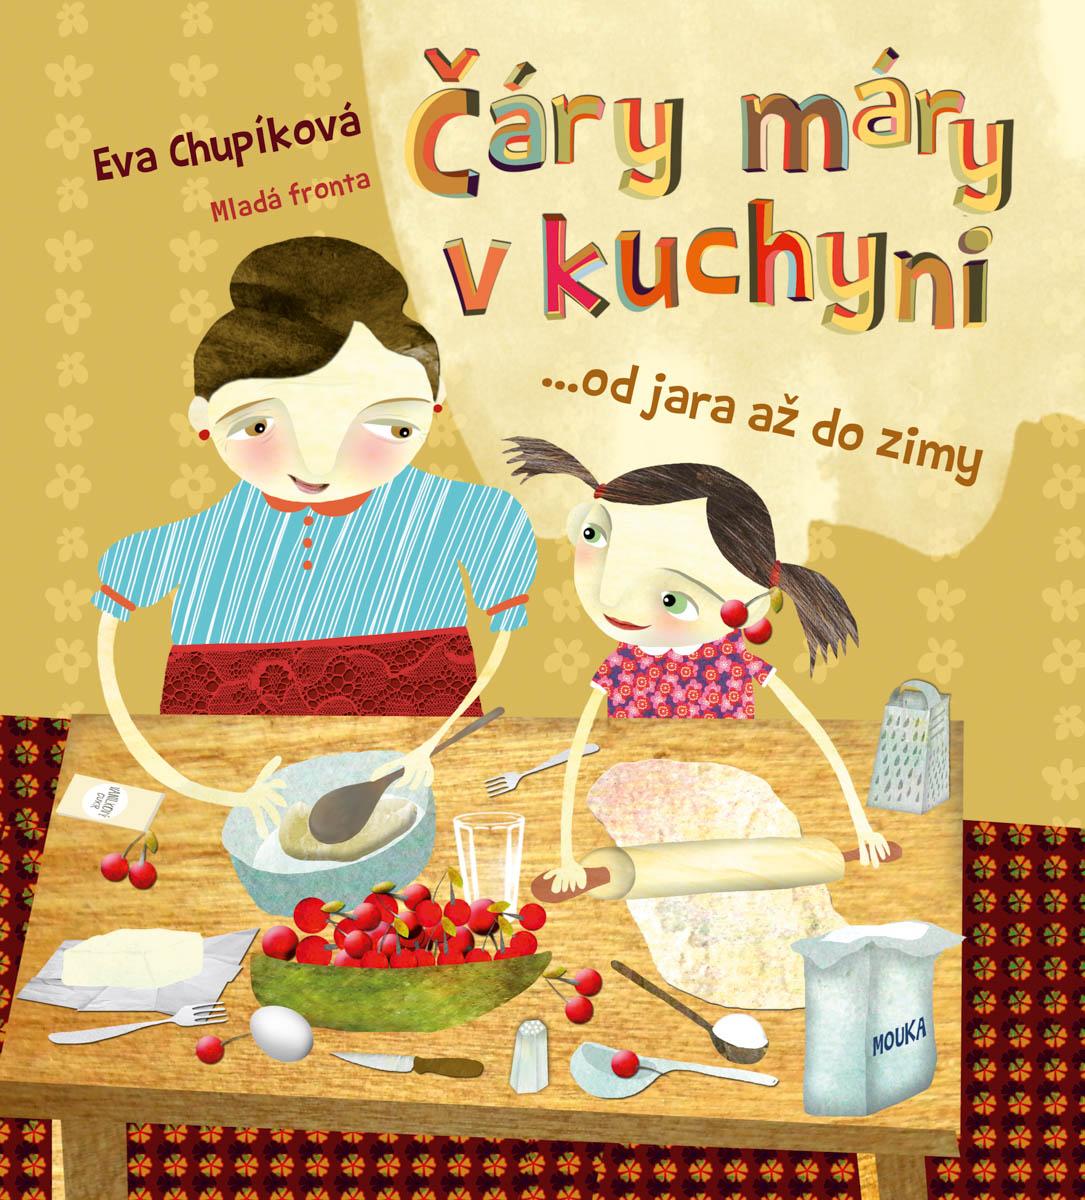 cary_mary_v_kuchyni_blok.indd